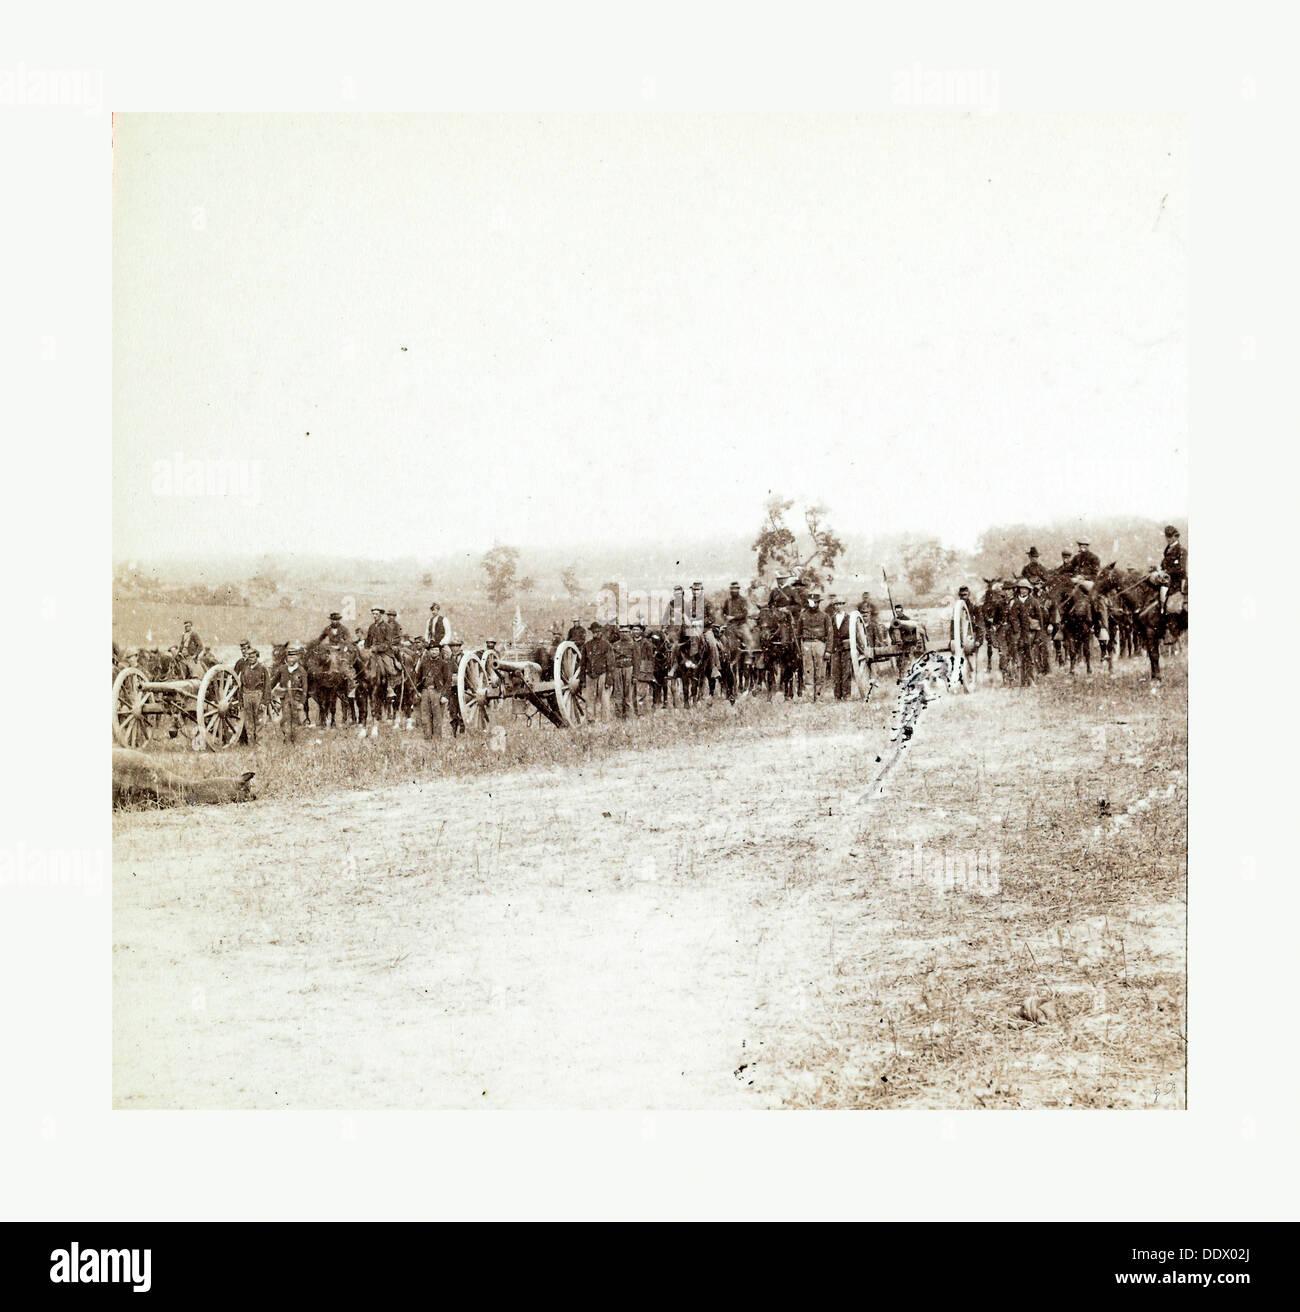 American Civil War: Captain J. M. Knap's Pennsylvania Independent Battery E Light Artillery approaching the battlefield - Stock Image